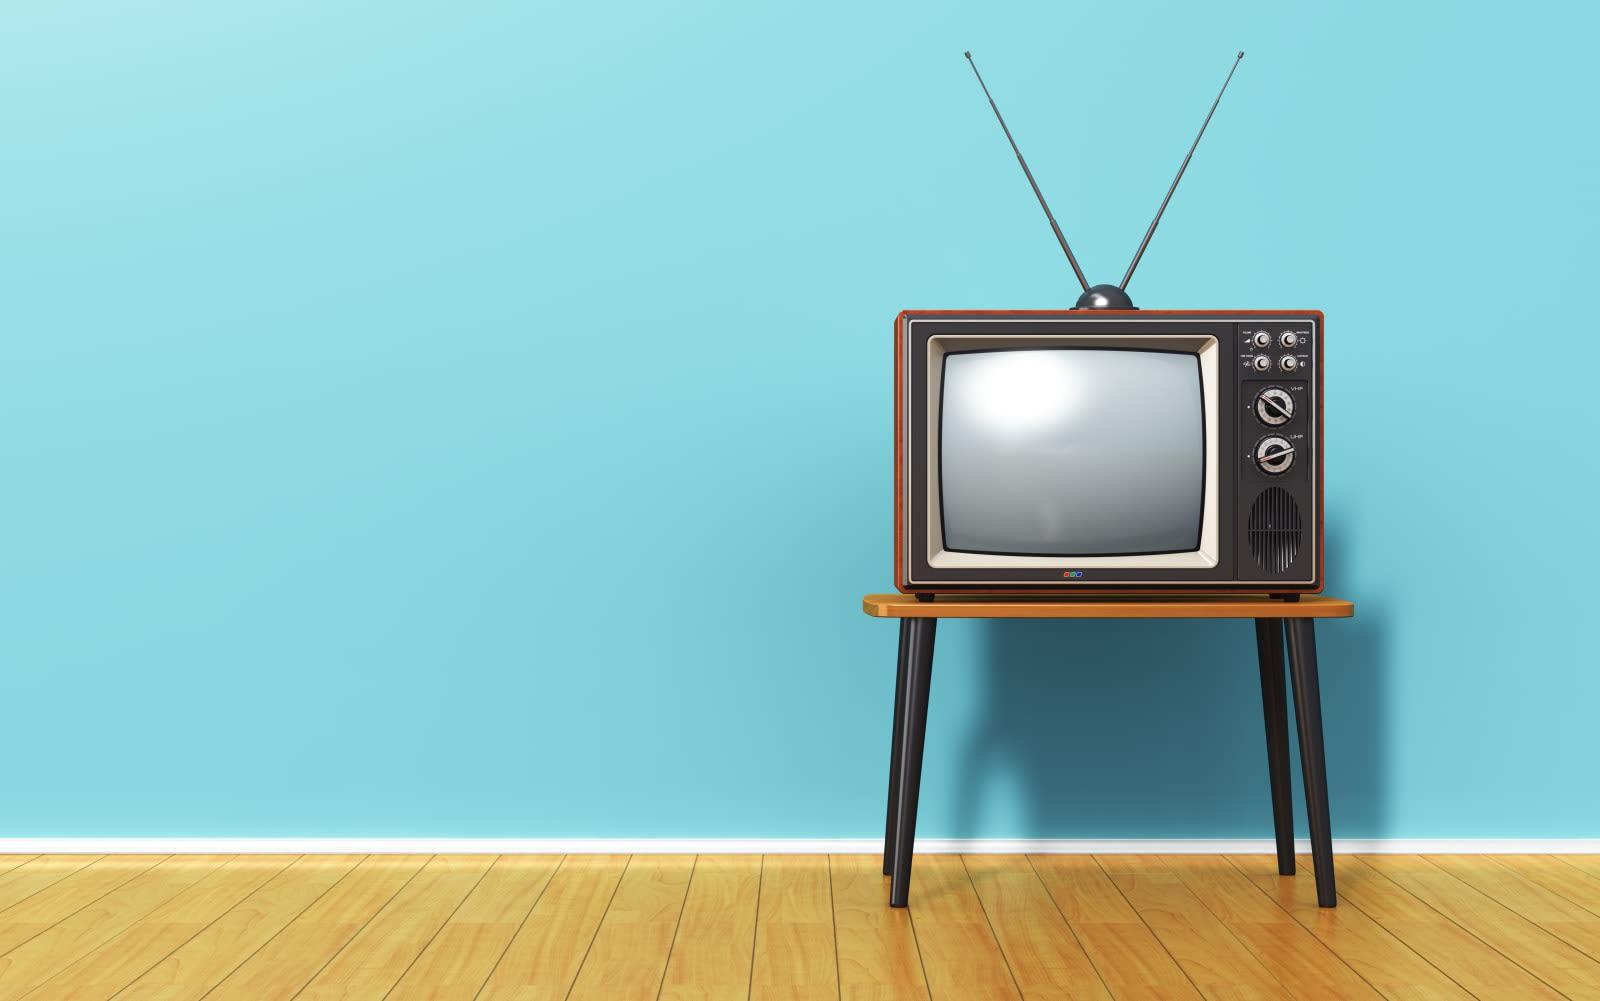 FCC approves Nexstar's $6.4 billion acquisition of Tribune Media